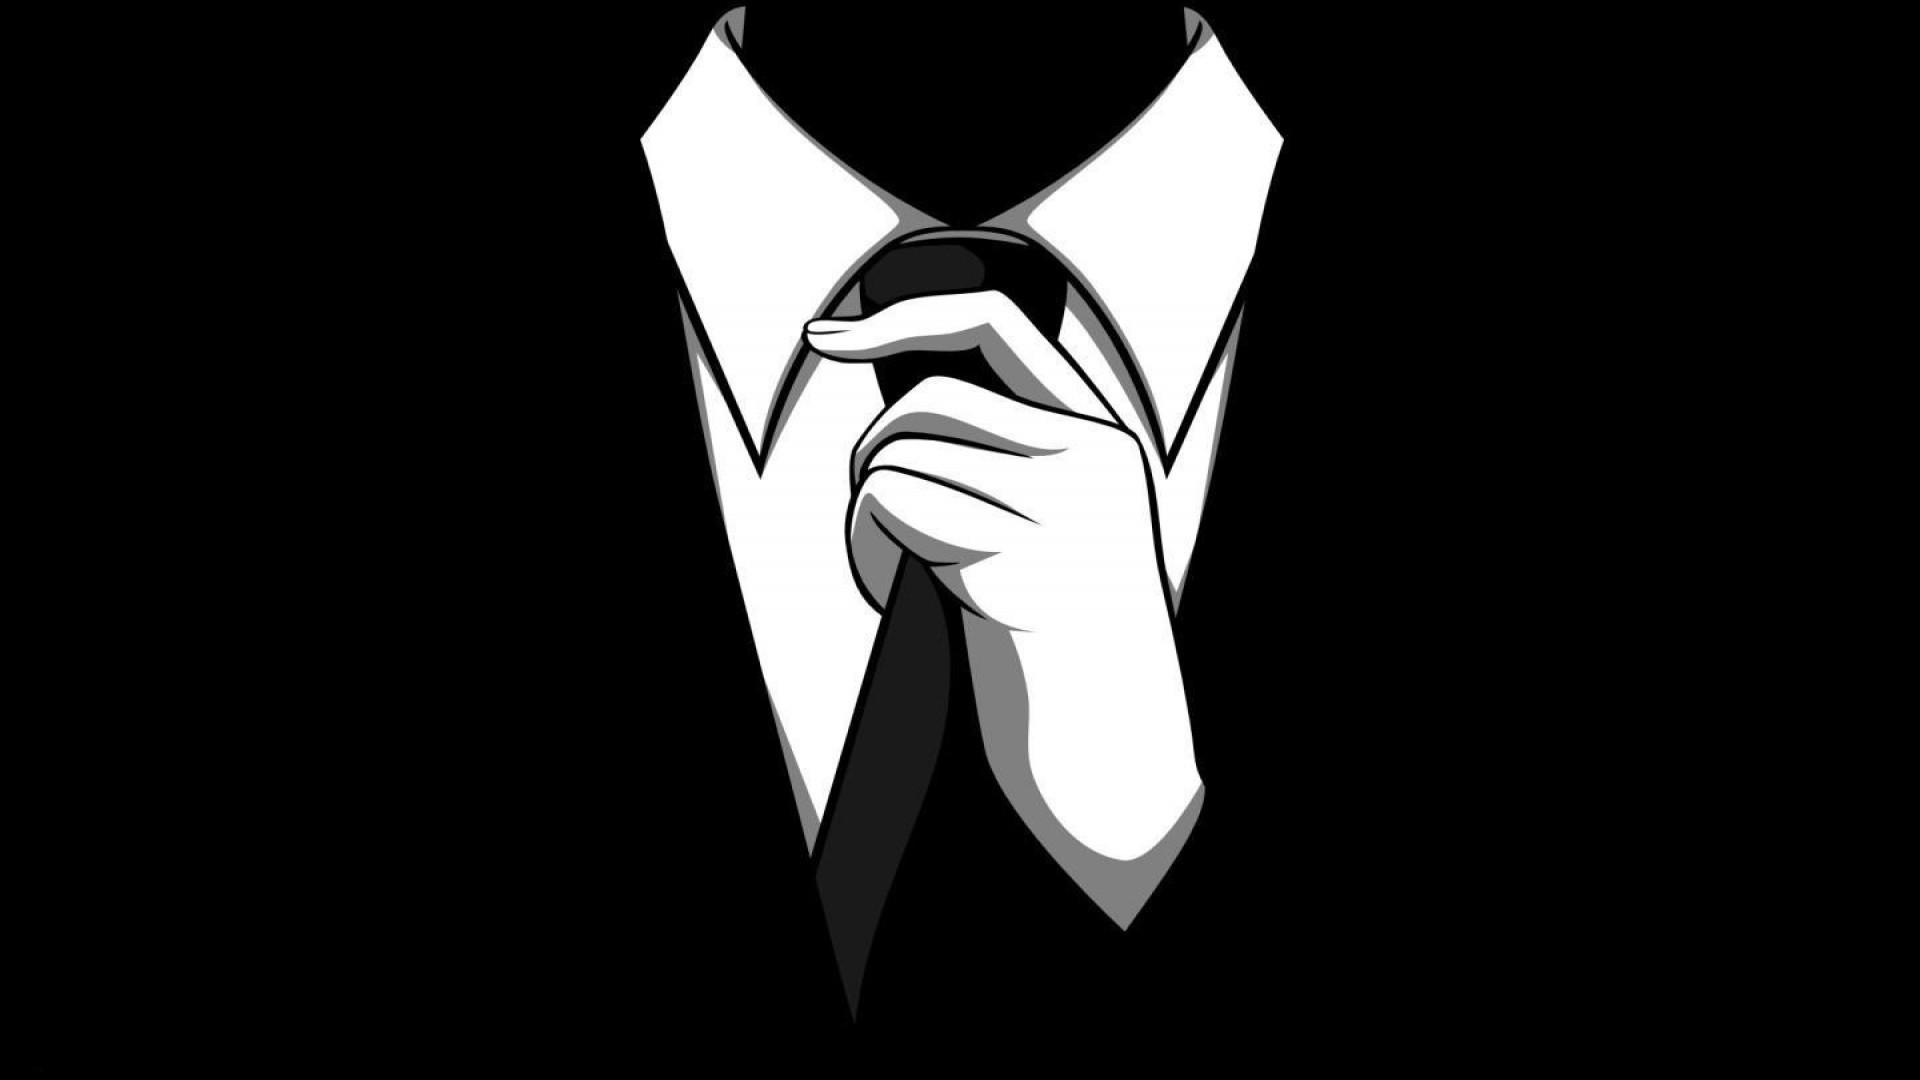 abstract anonymous dark gloves scary noir tie men barney stinson  wallpaper Wallpaper HD